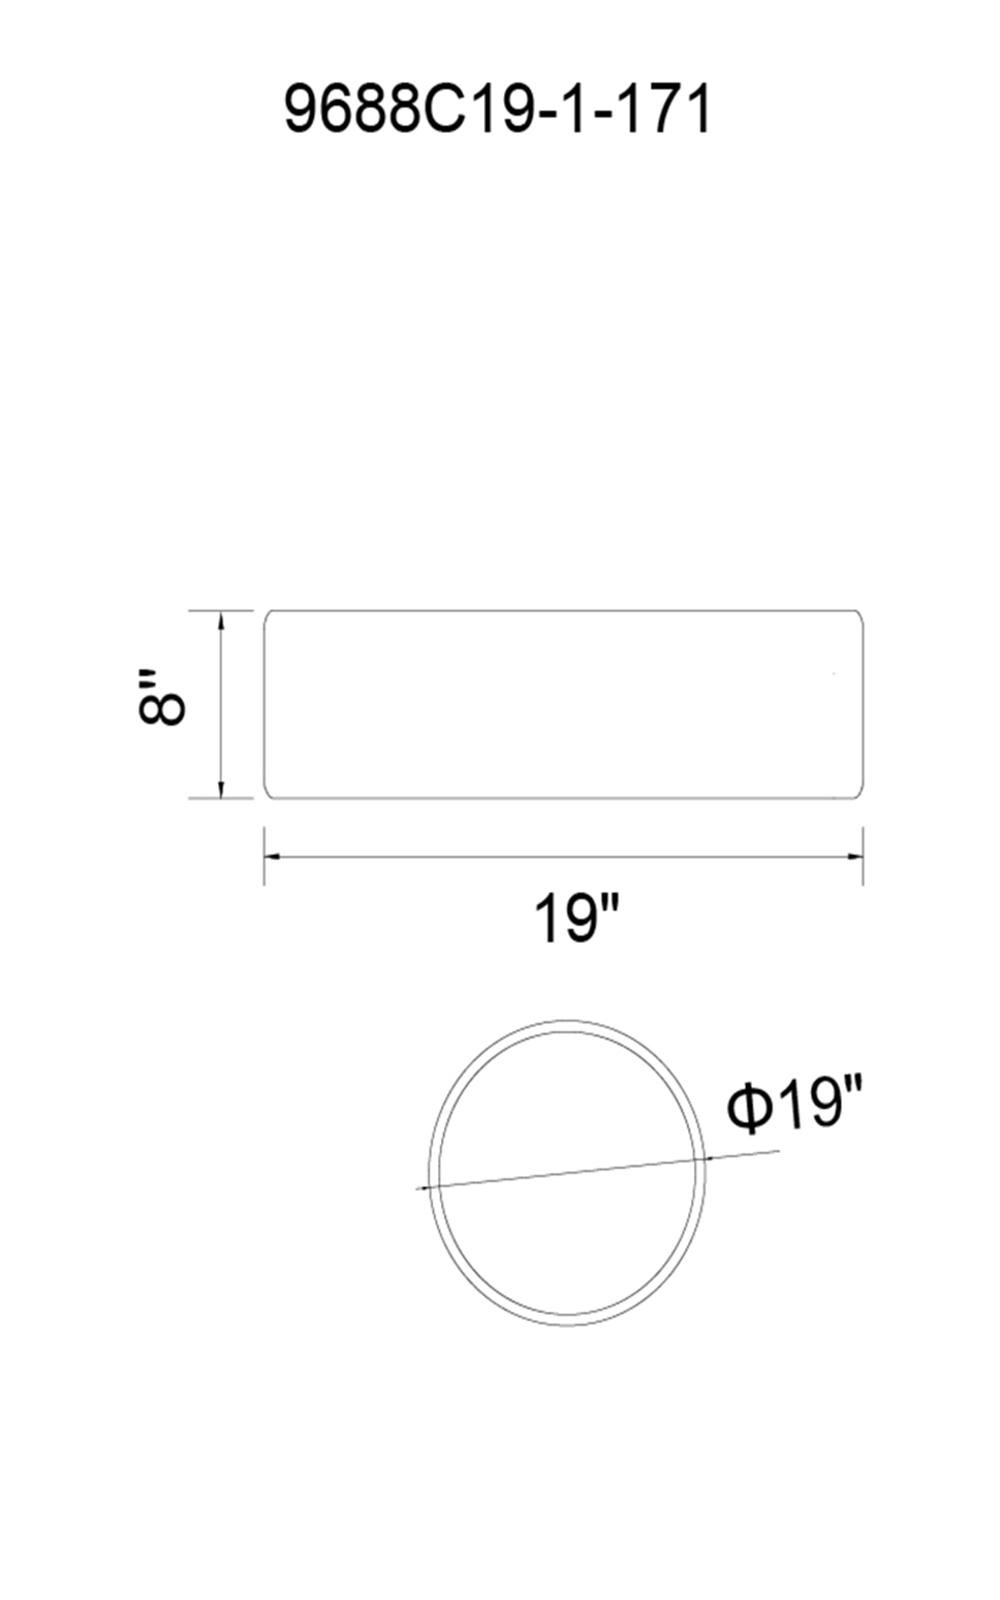 CWI Lighting Campton 3 Light Drum Shade Flush Mount With Black Model: 9688C19-3-171 Line Drawing